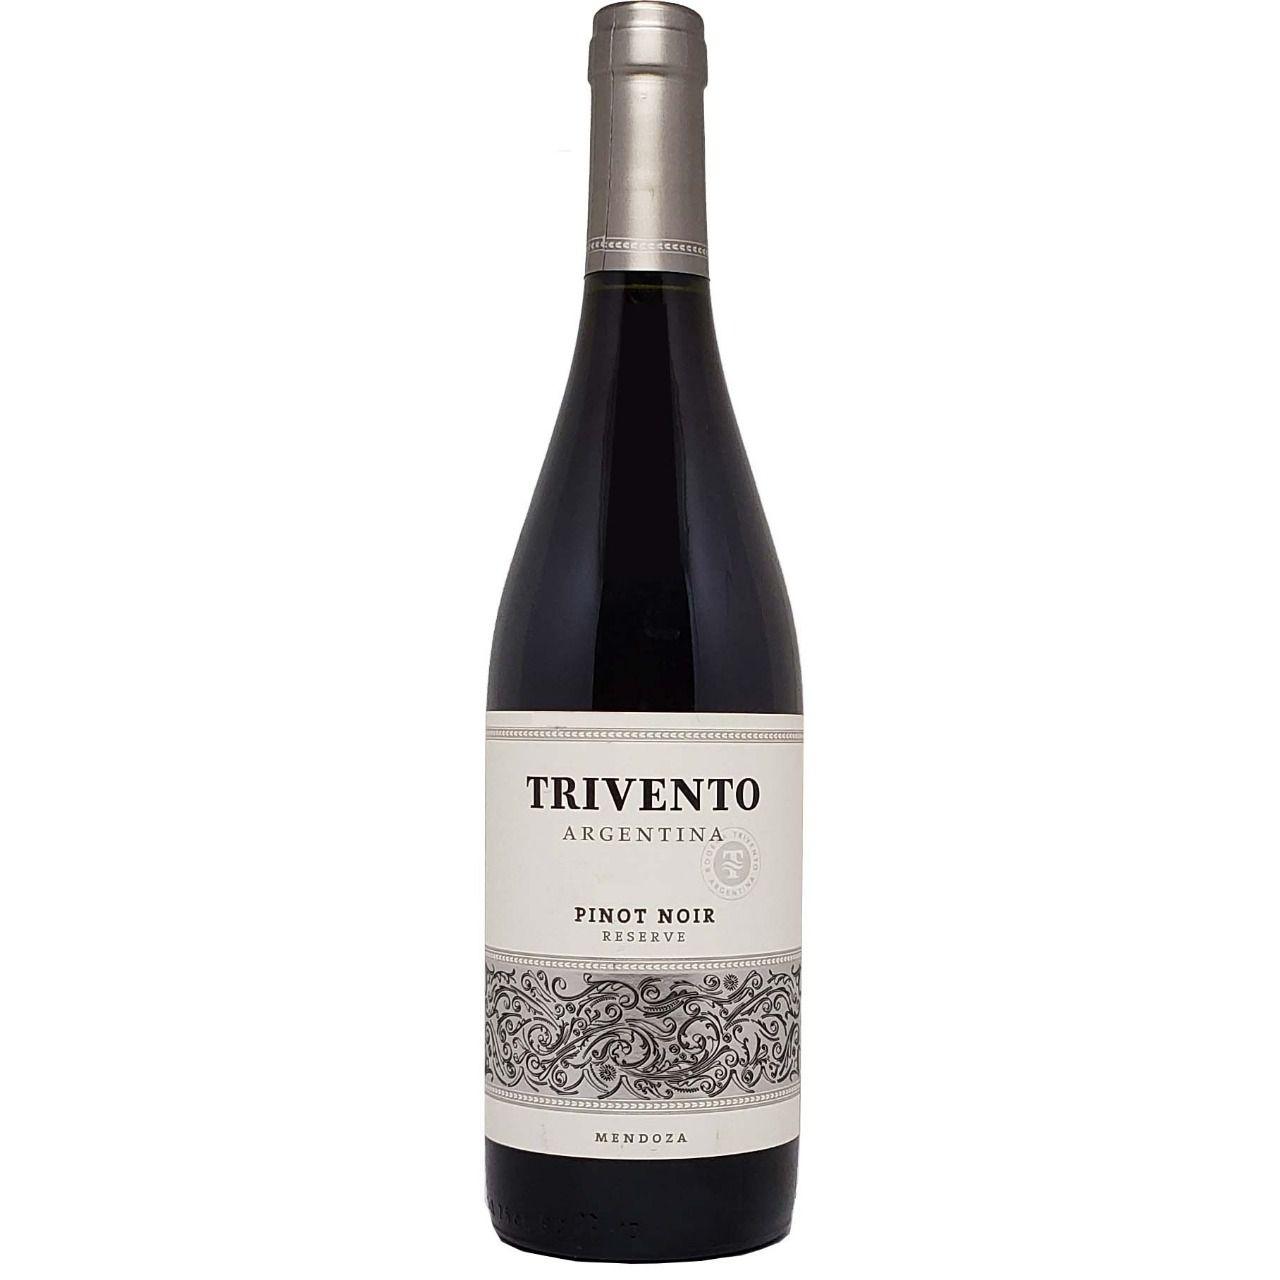 Vinho Trivento Reserve Pinot Noir - 750ml -